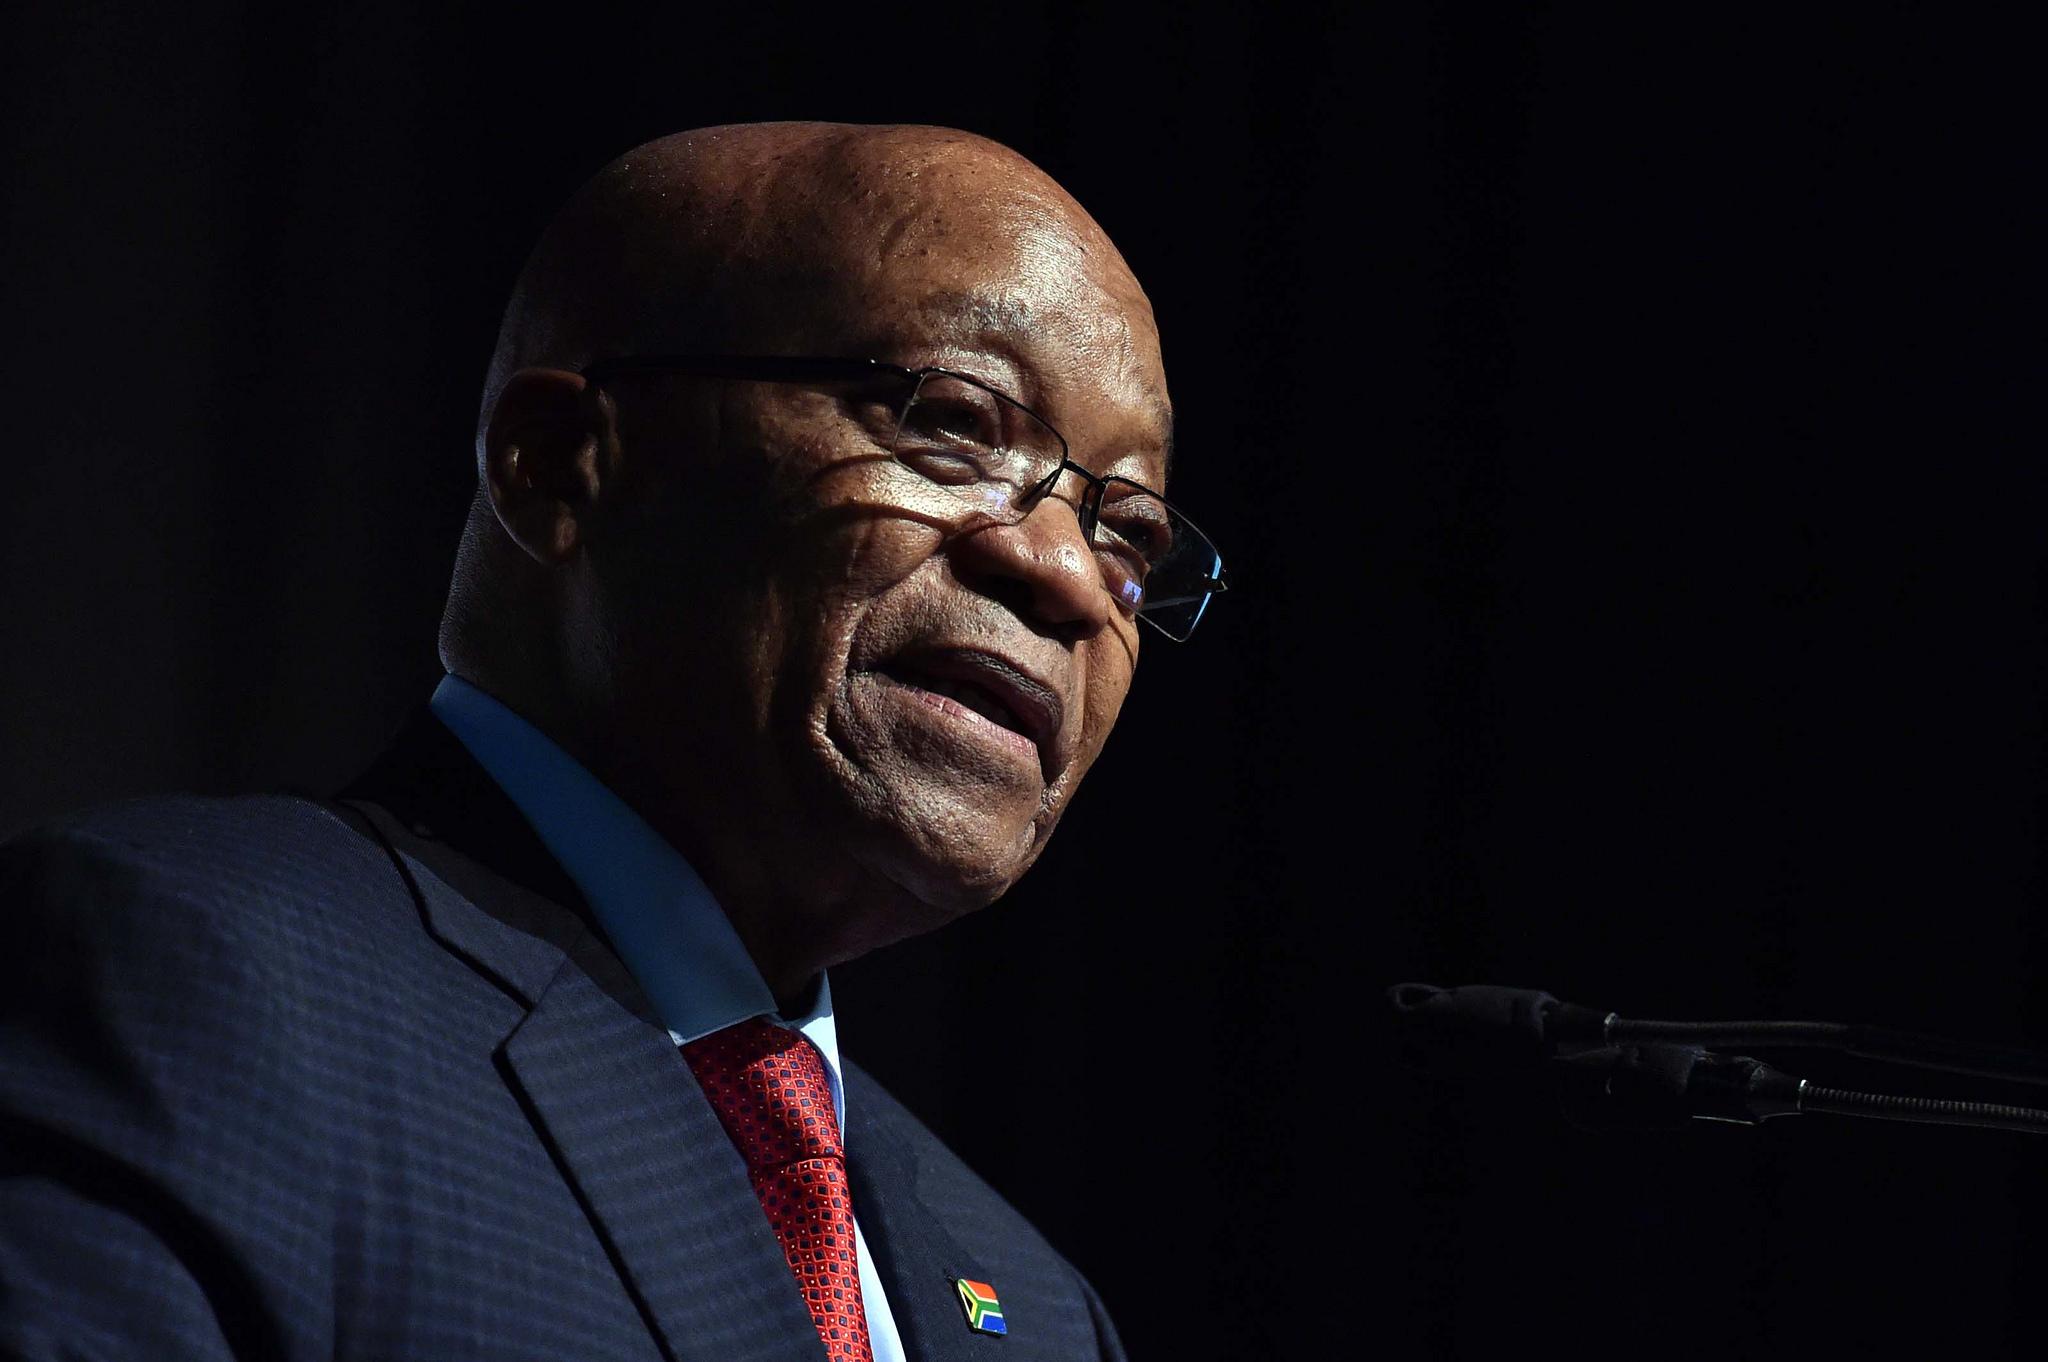 Jacob Zuma portrait stare